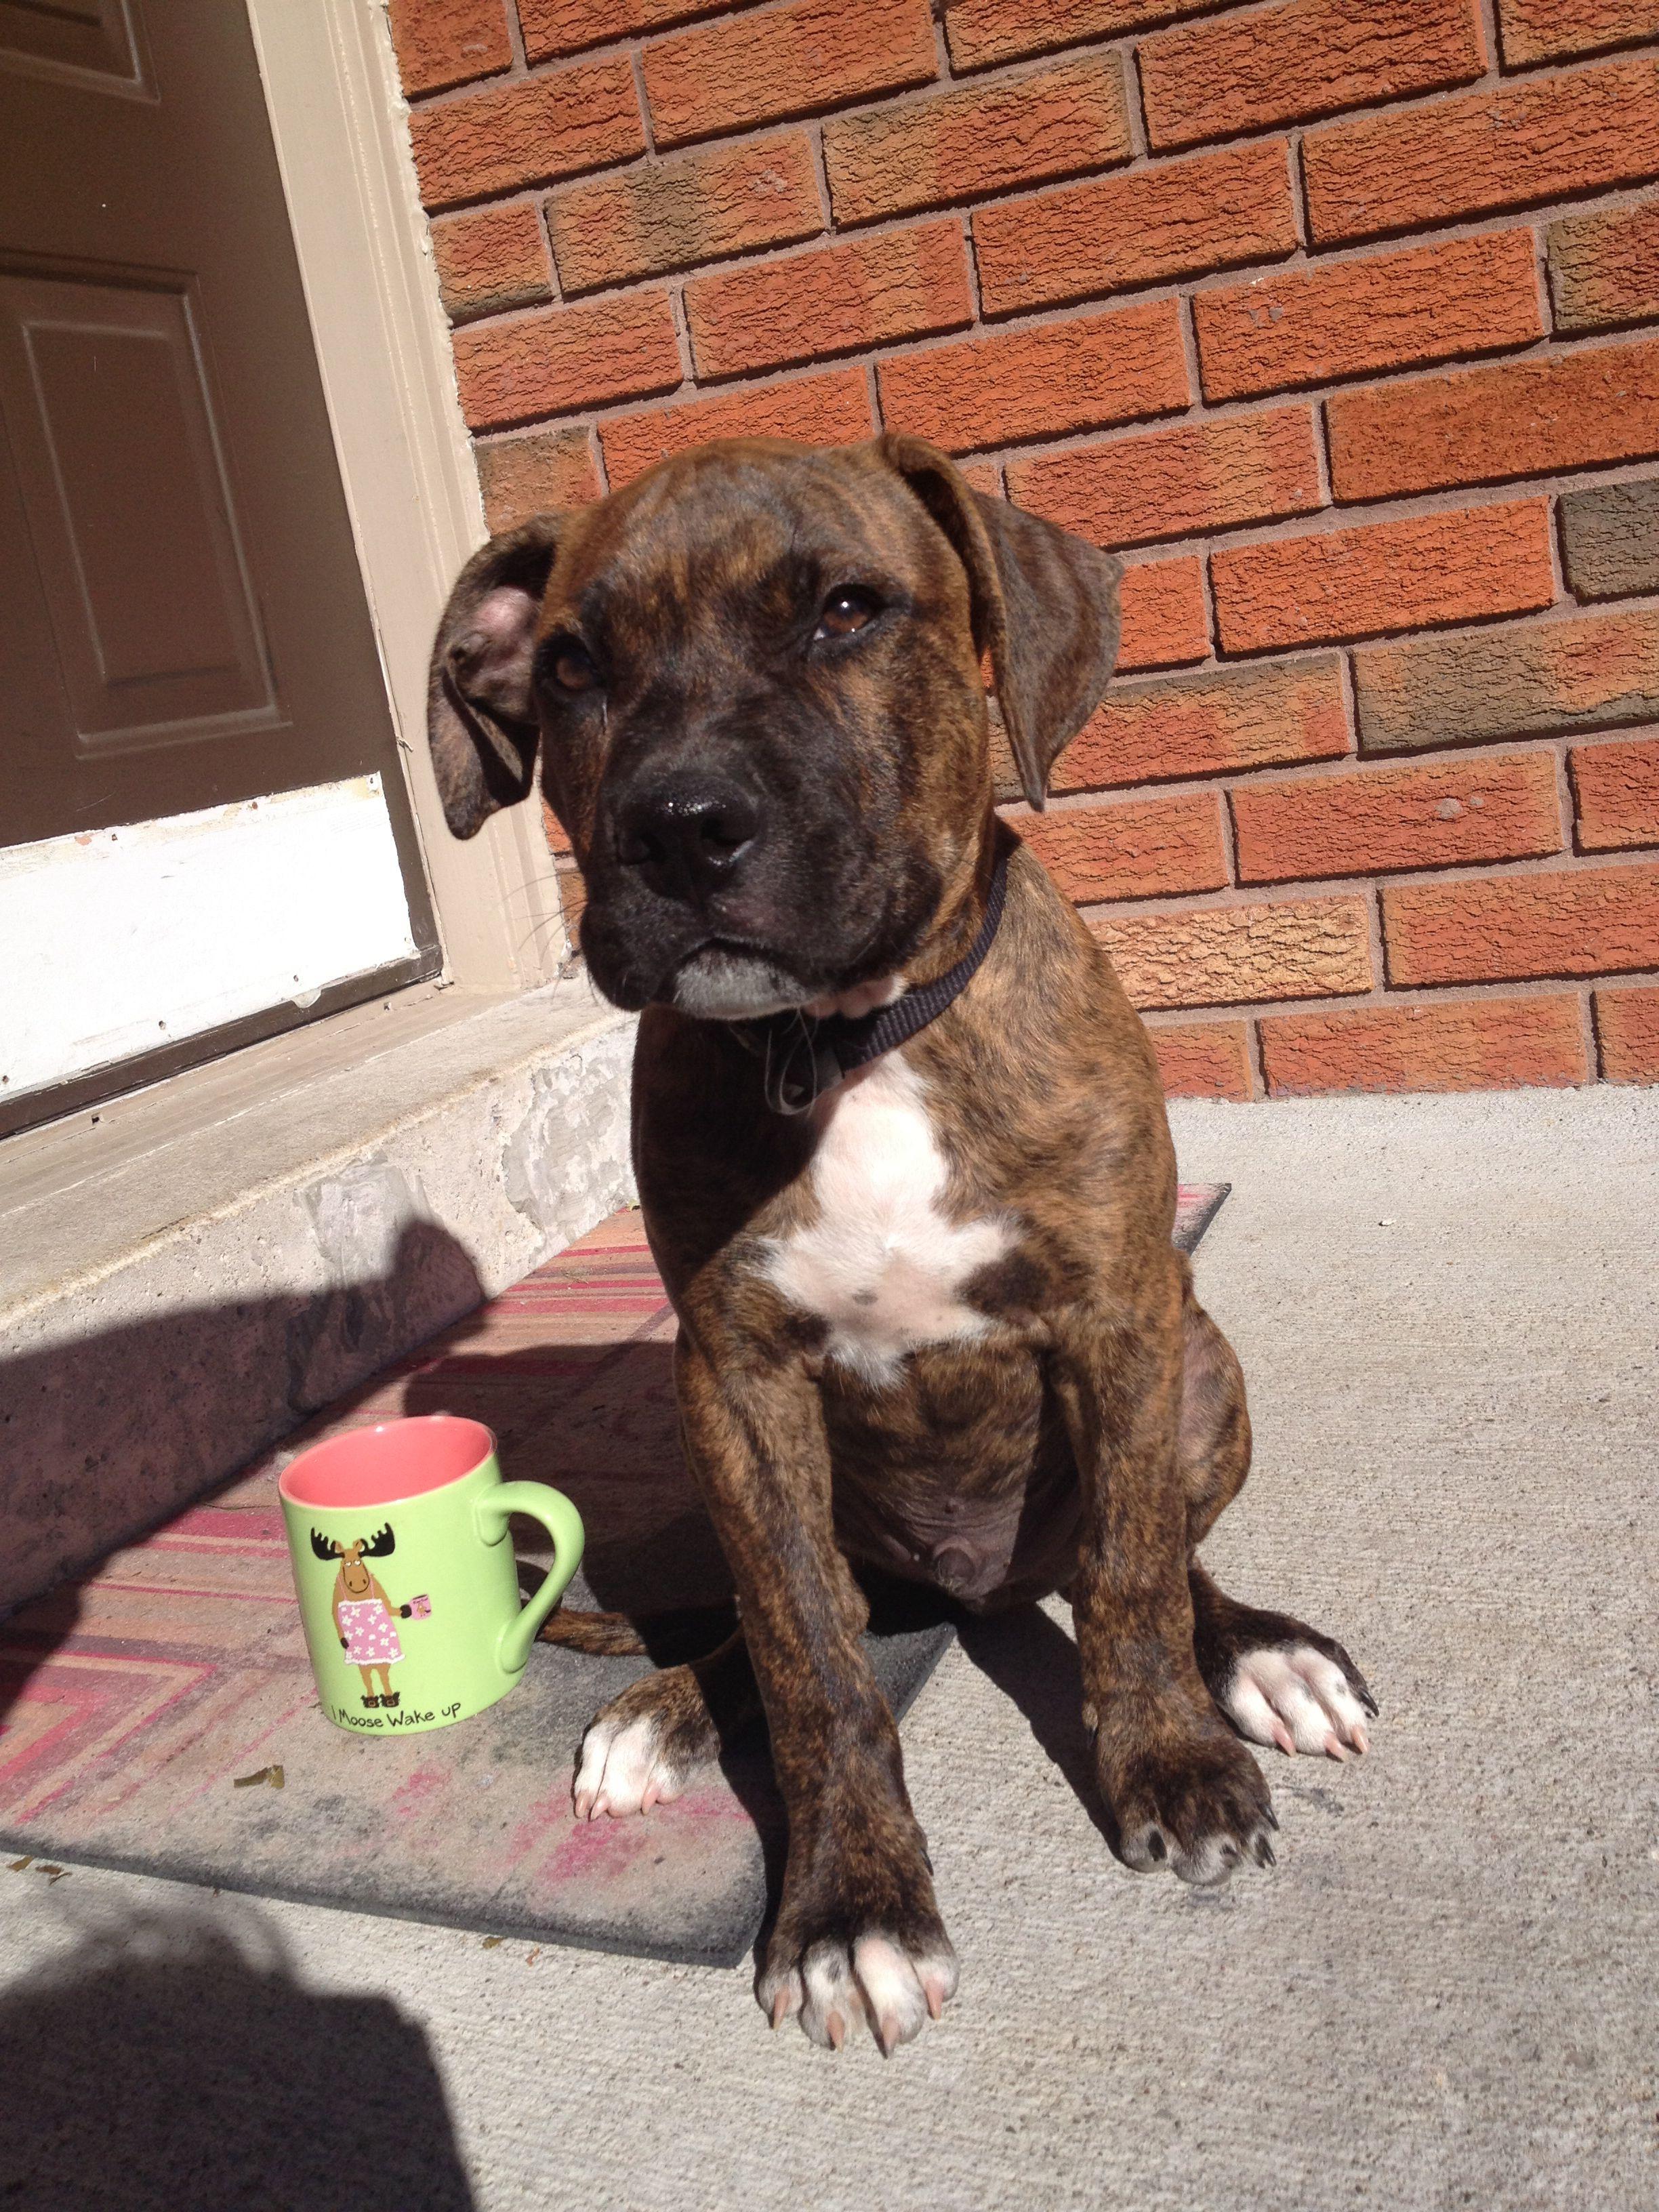 Bullmastiff Puppy 11 Weeks Jax Goodboy Dog Boarding Bull